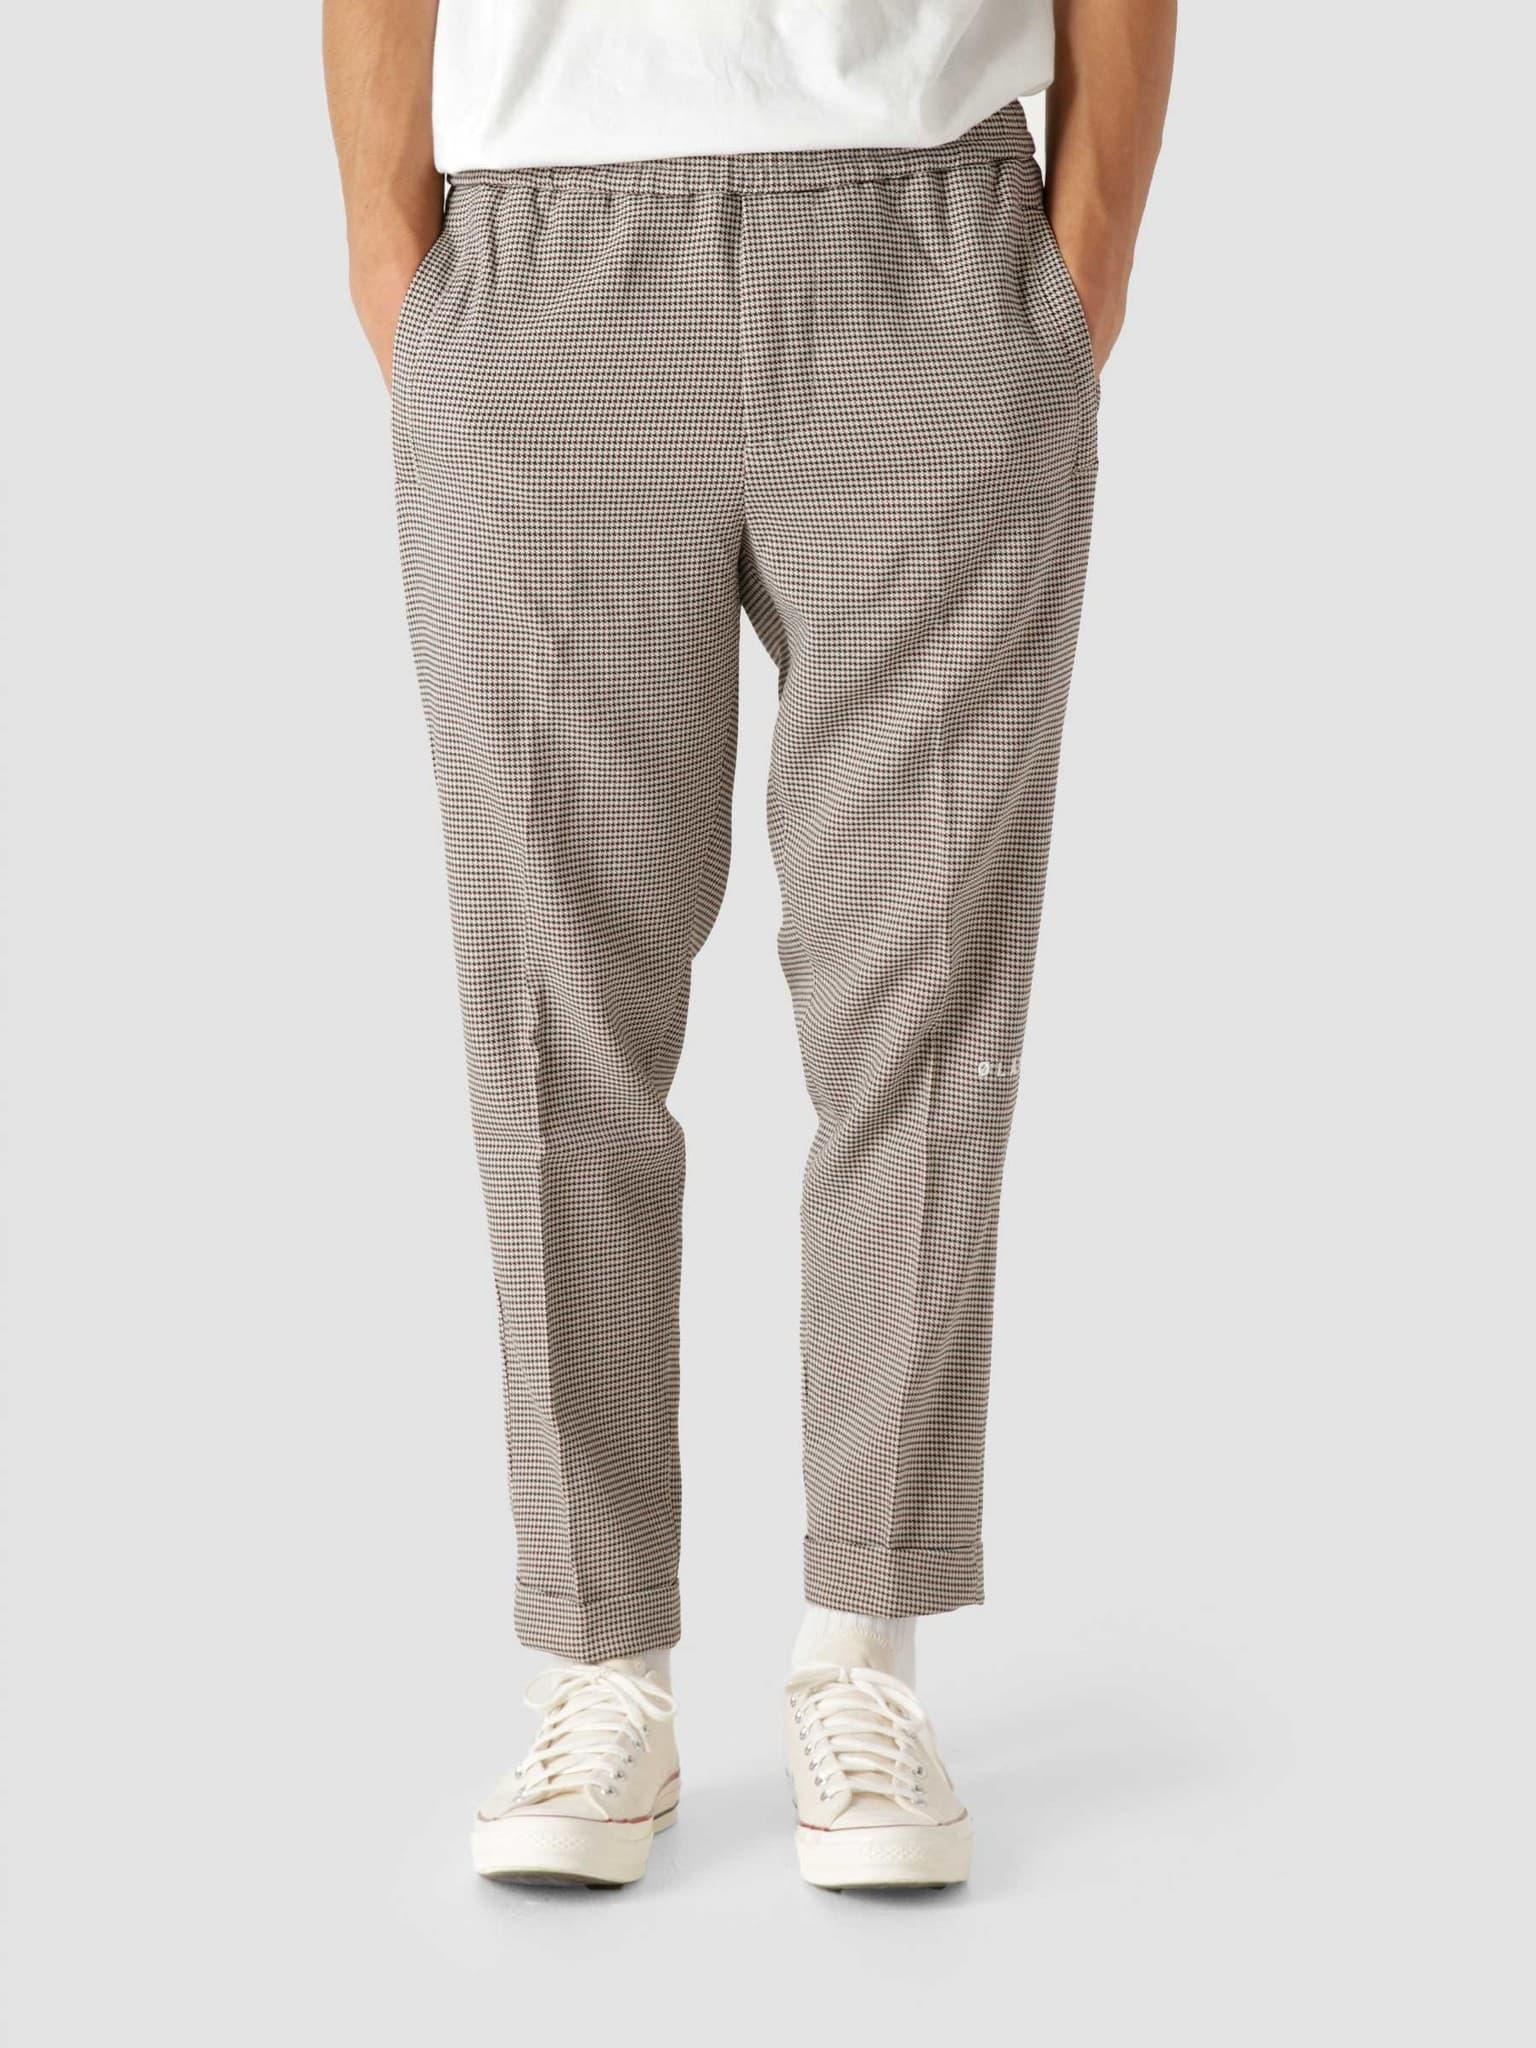 OLAF Slim Elasticated Trousers Houndstooth